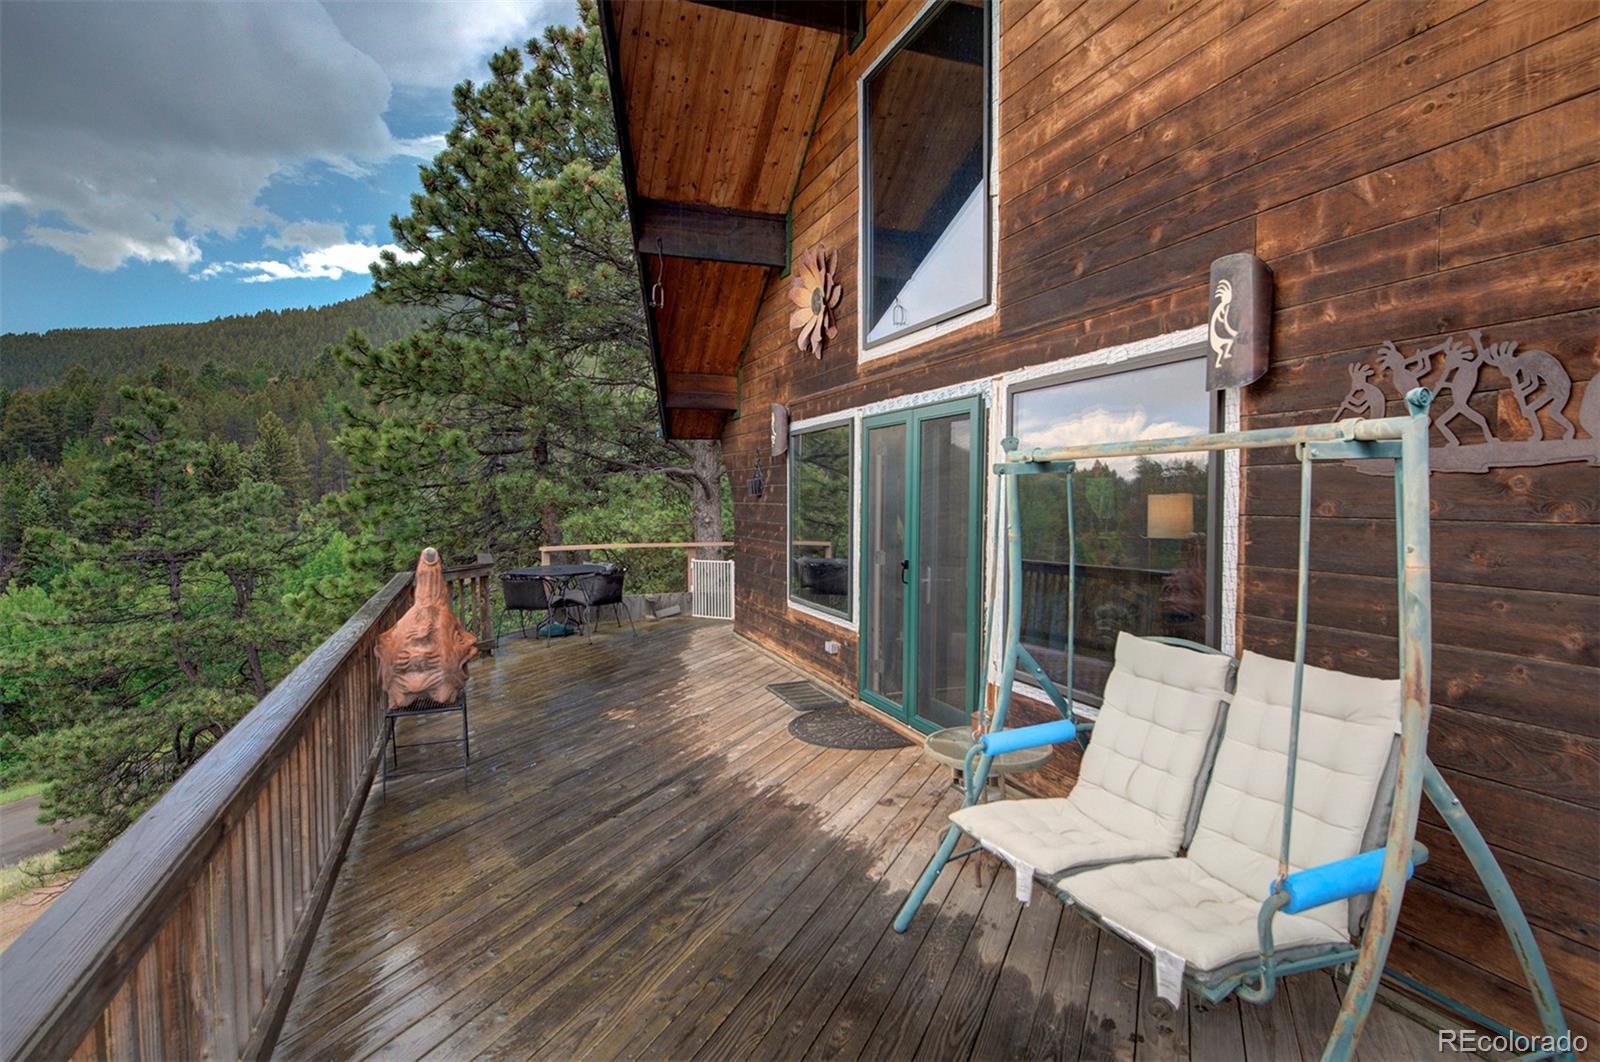 MLS# 6922377 - 37 - 12123 Geronimo Trail, Conifer, CO 80433